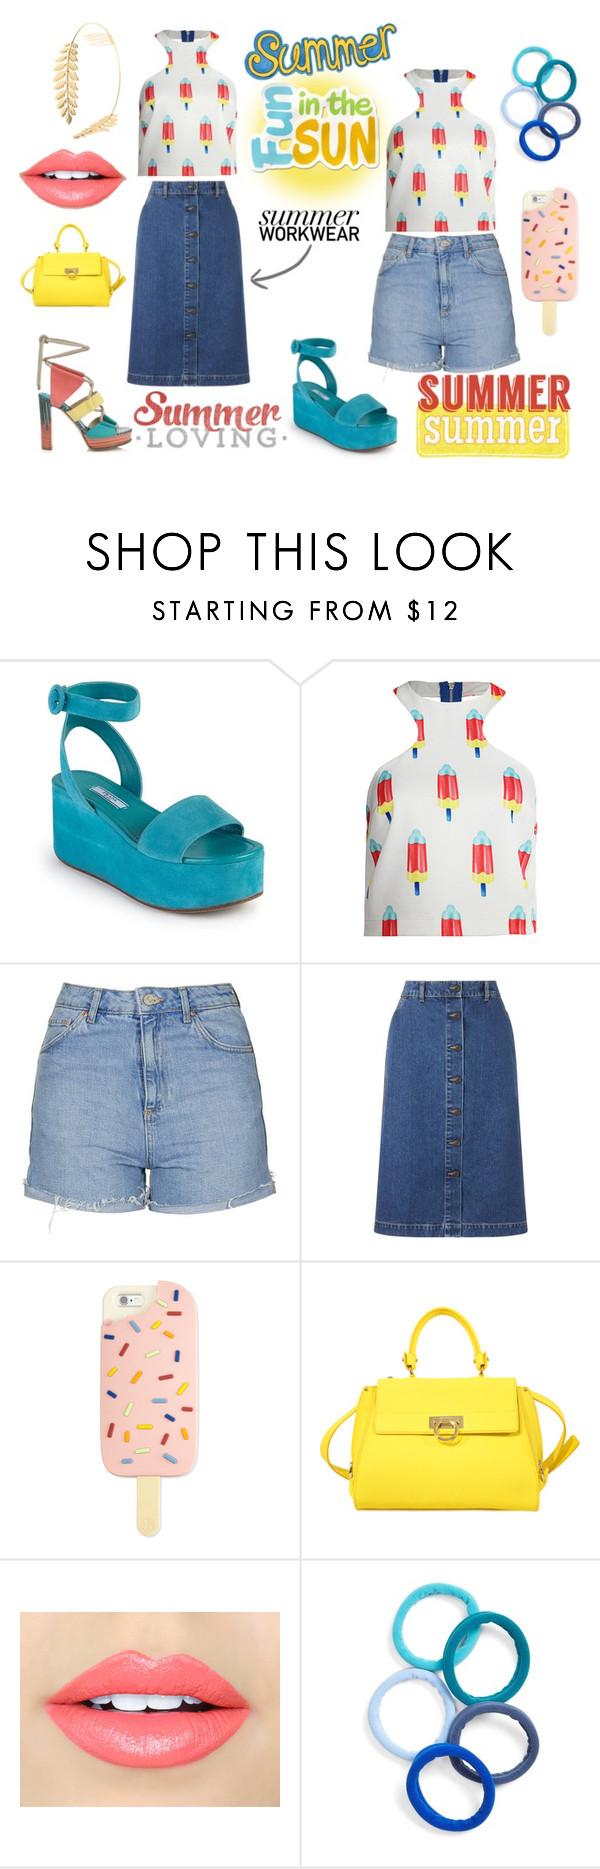 """Summer Power"" by closet365 on Polyvore featuring moda, Prada, re:named, Topshop, John Lewis, Jimmy Choo, Tory Burch, Salvatore Ferragamo, Fiebiger y L. Erickson"